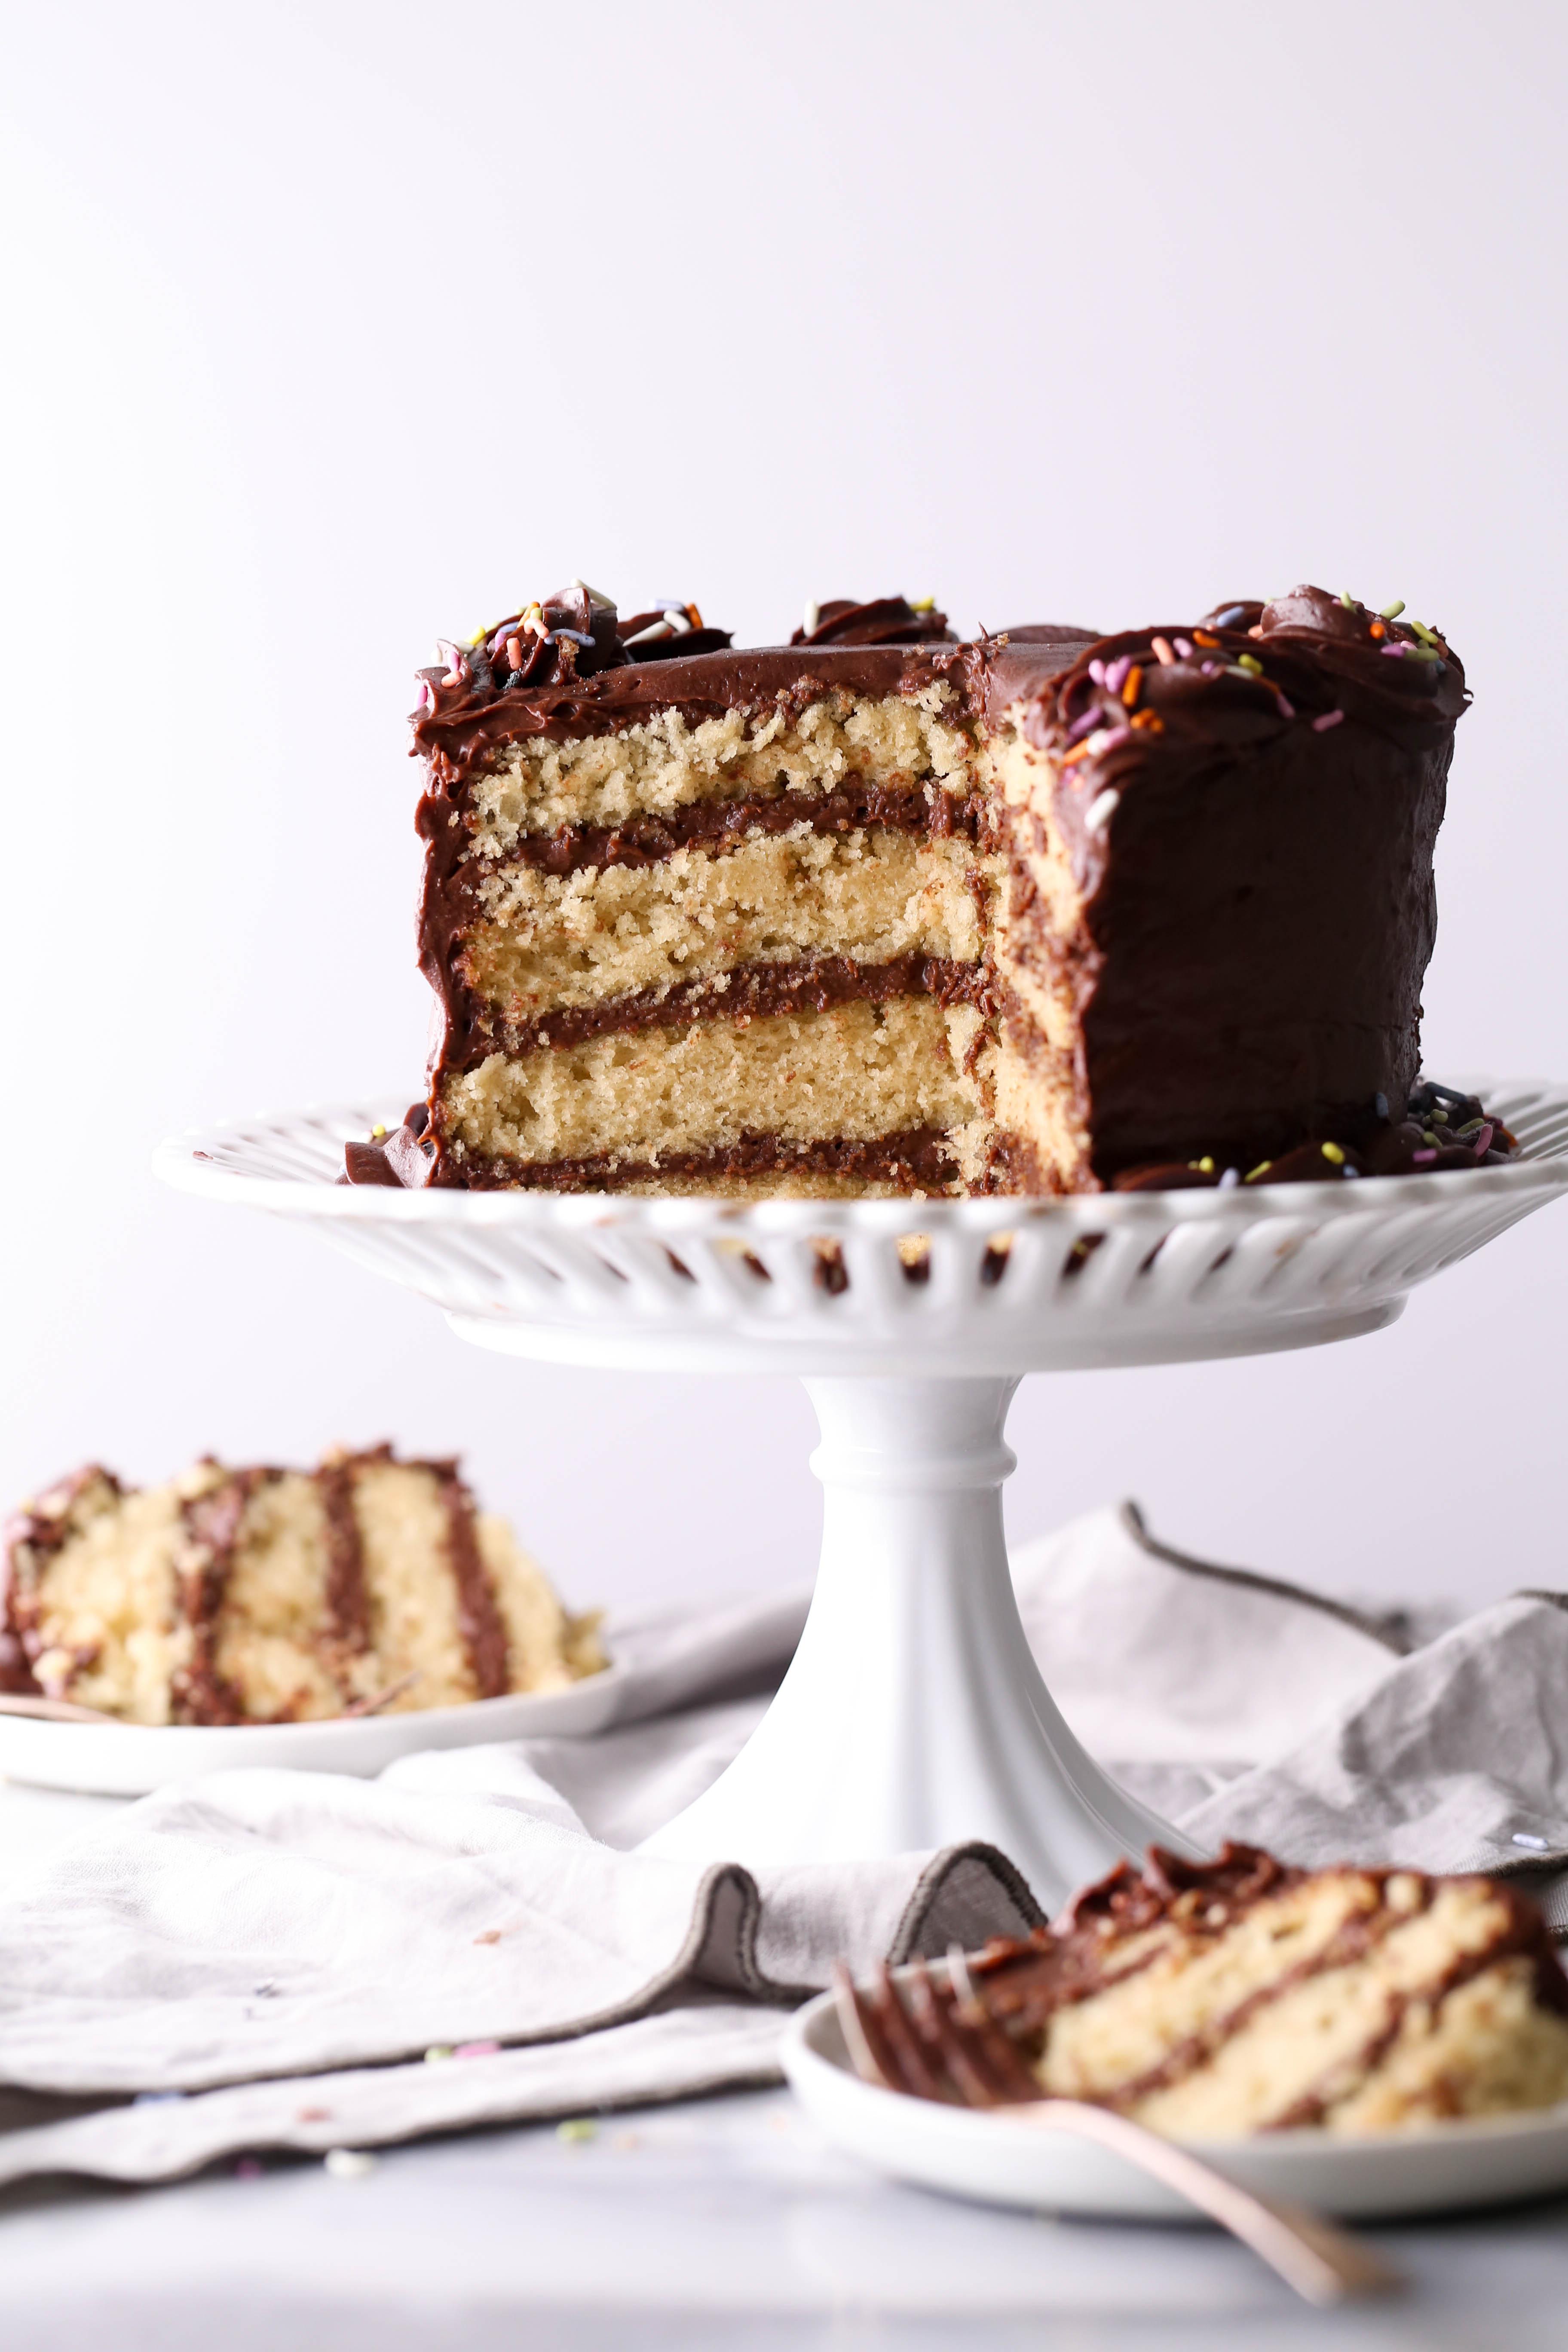 Vegan Vanilla Cake with Chocolate Frosting